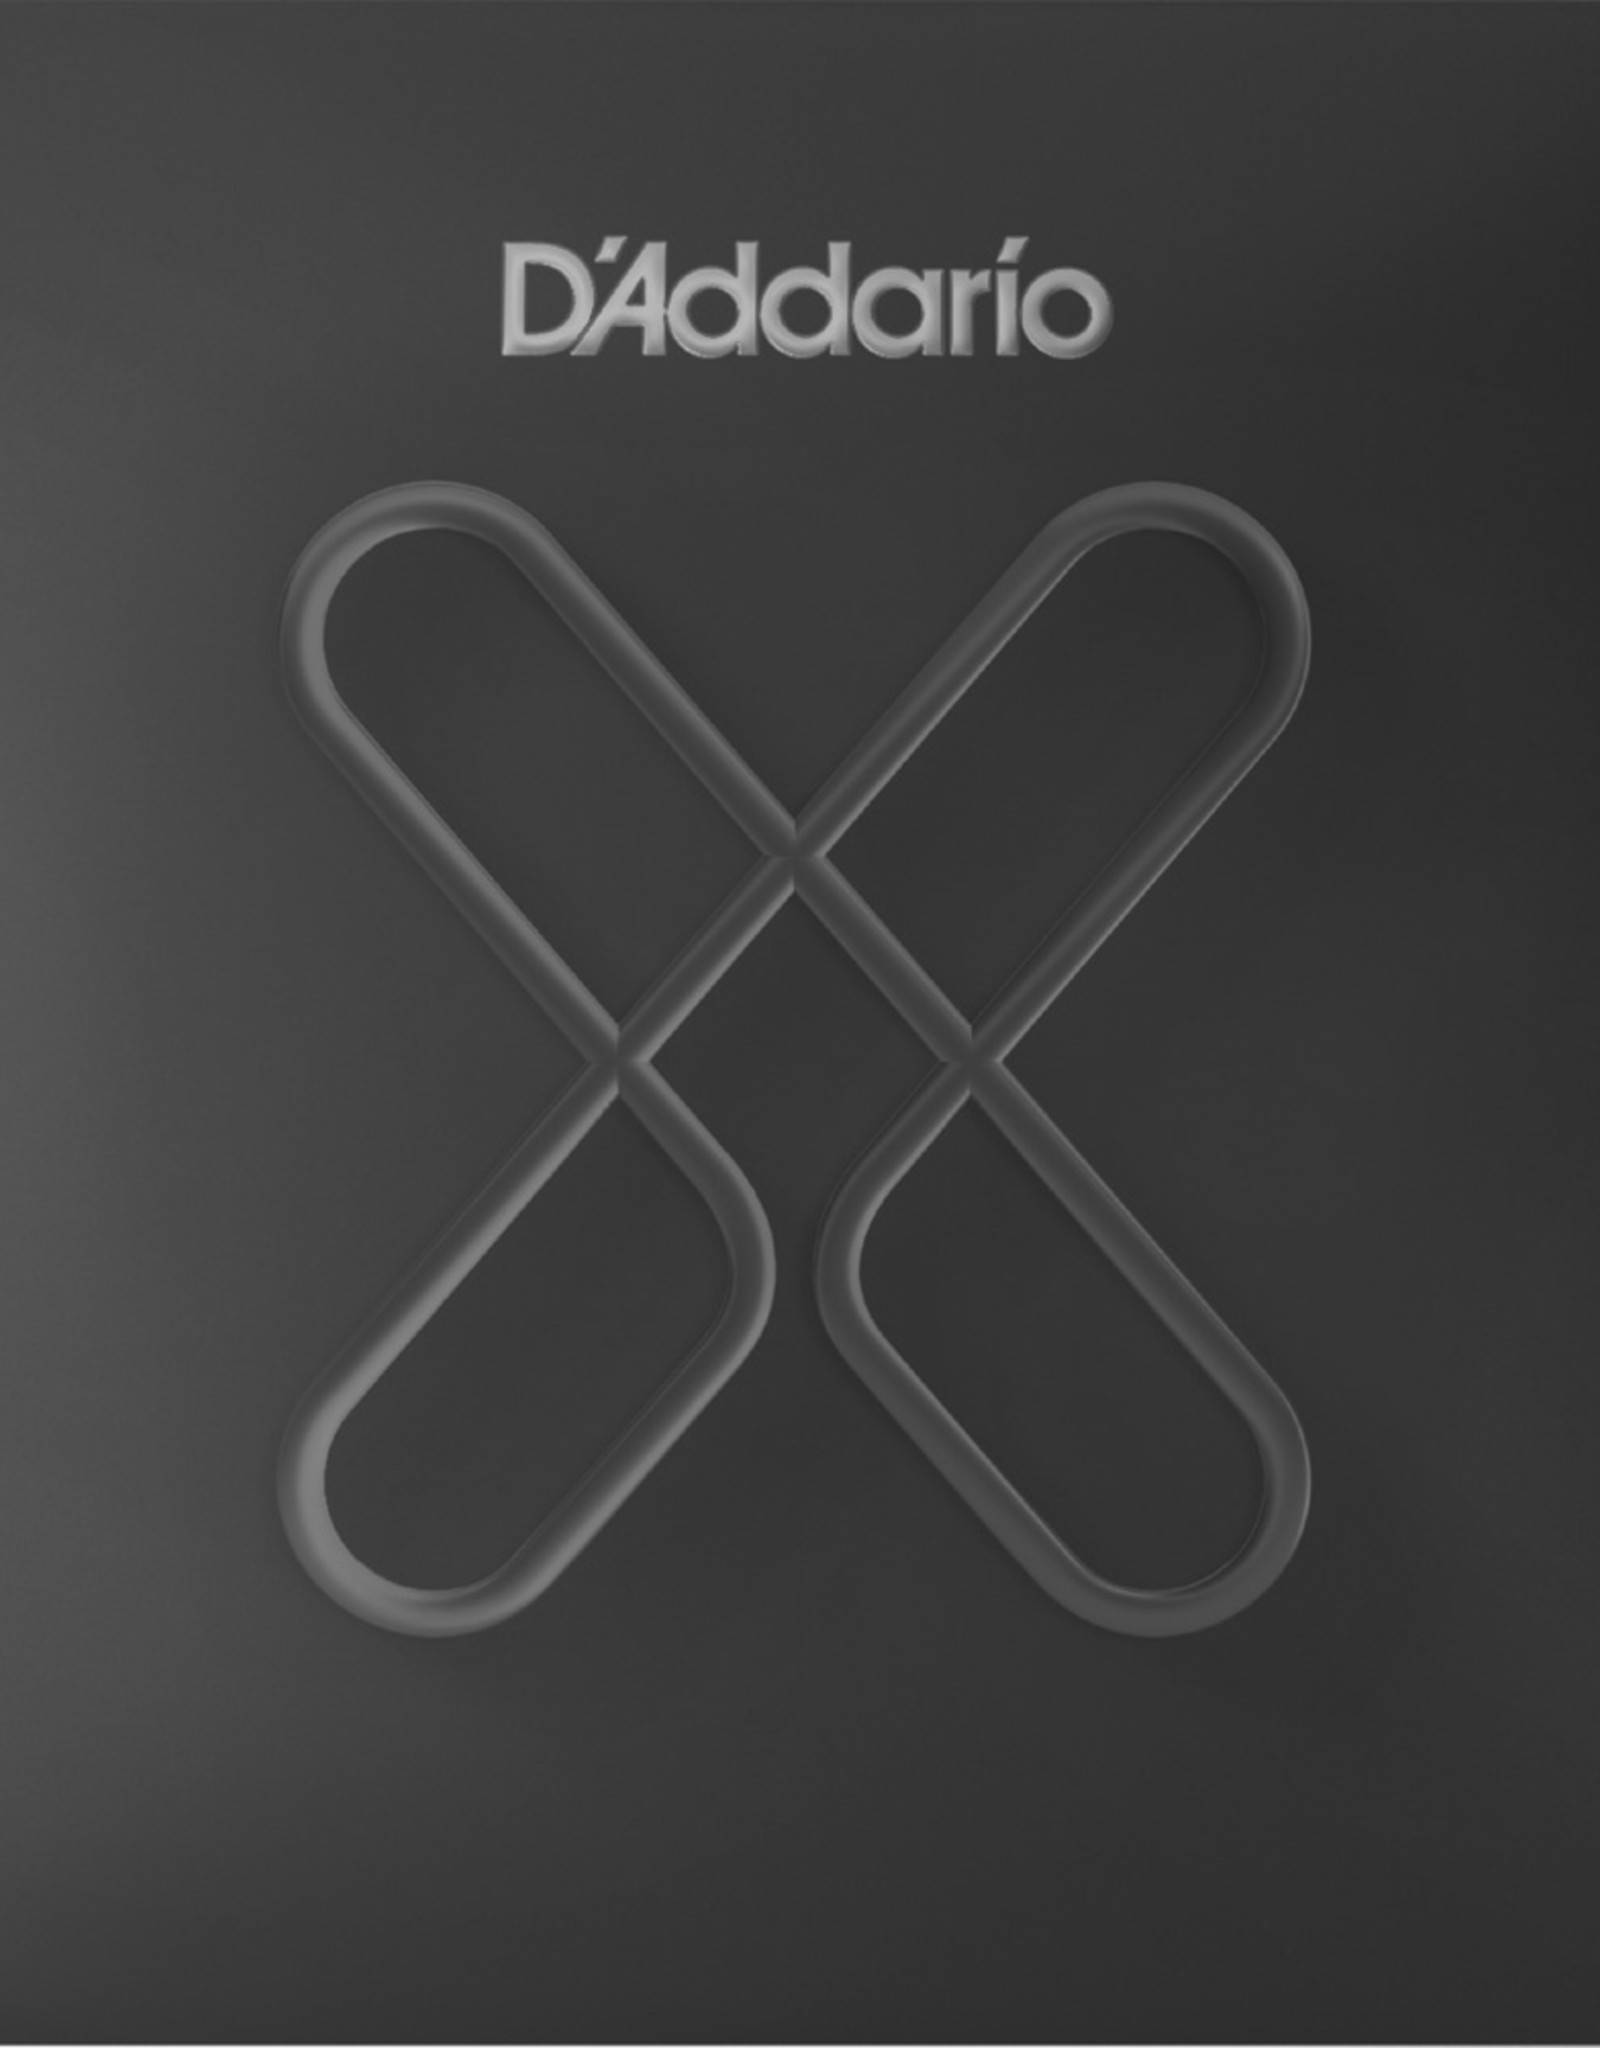 D'Addario D'Addario XT Mandolin Phosphor Bronze, Medium, 11-40